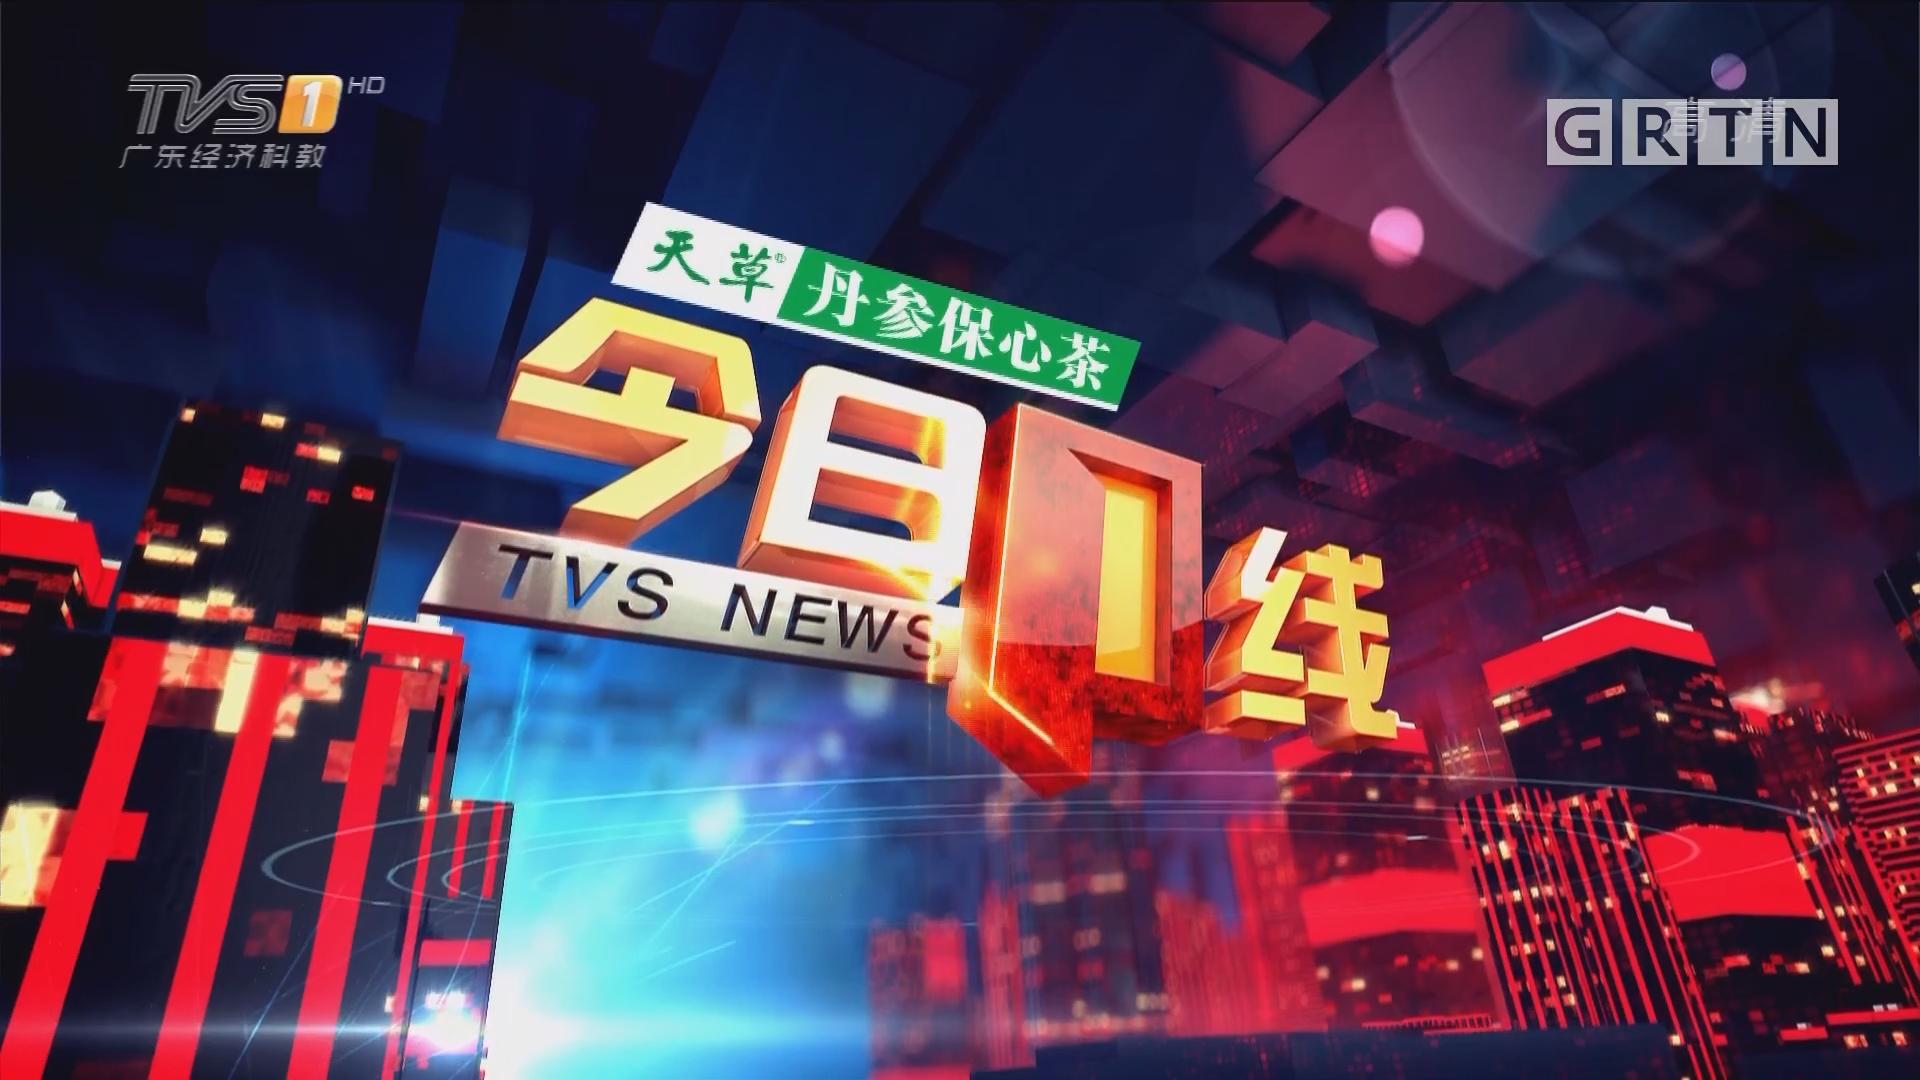 [HD][2018-08-21]今日一线:惠州博罗县:孩子上游泳班 多人游泳后反复高烧